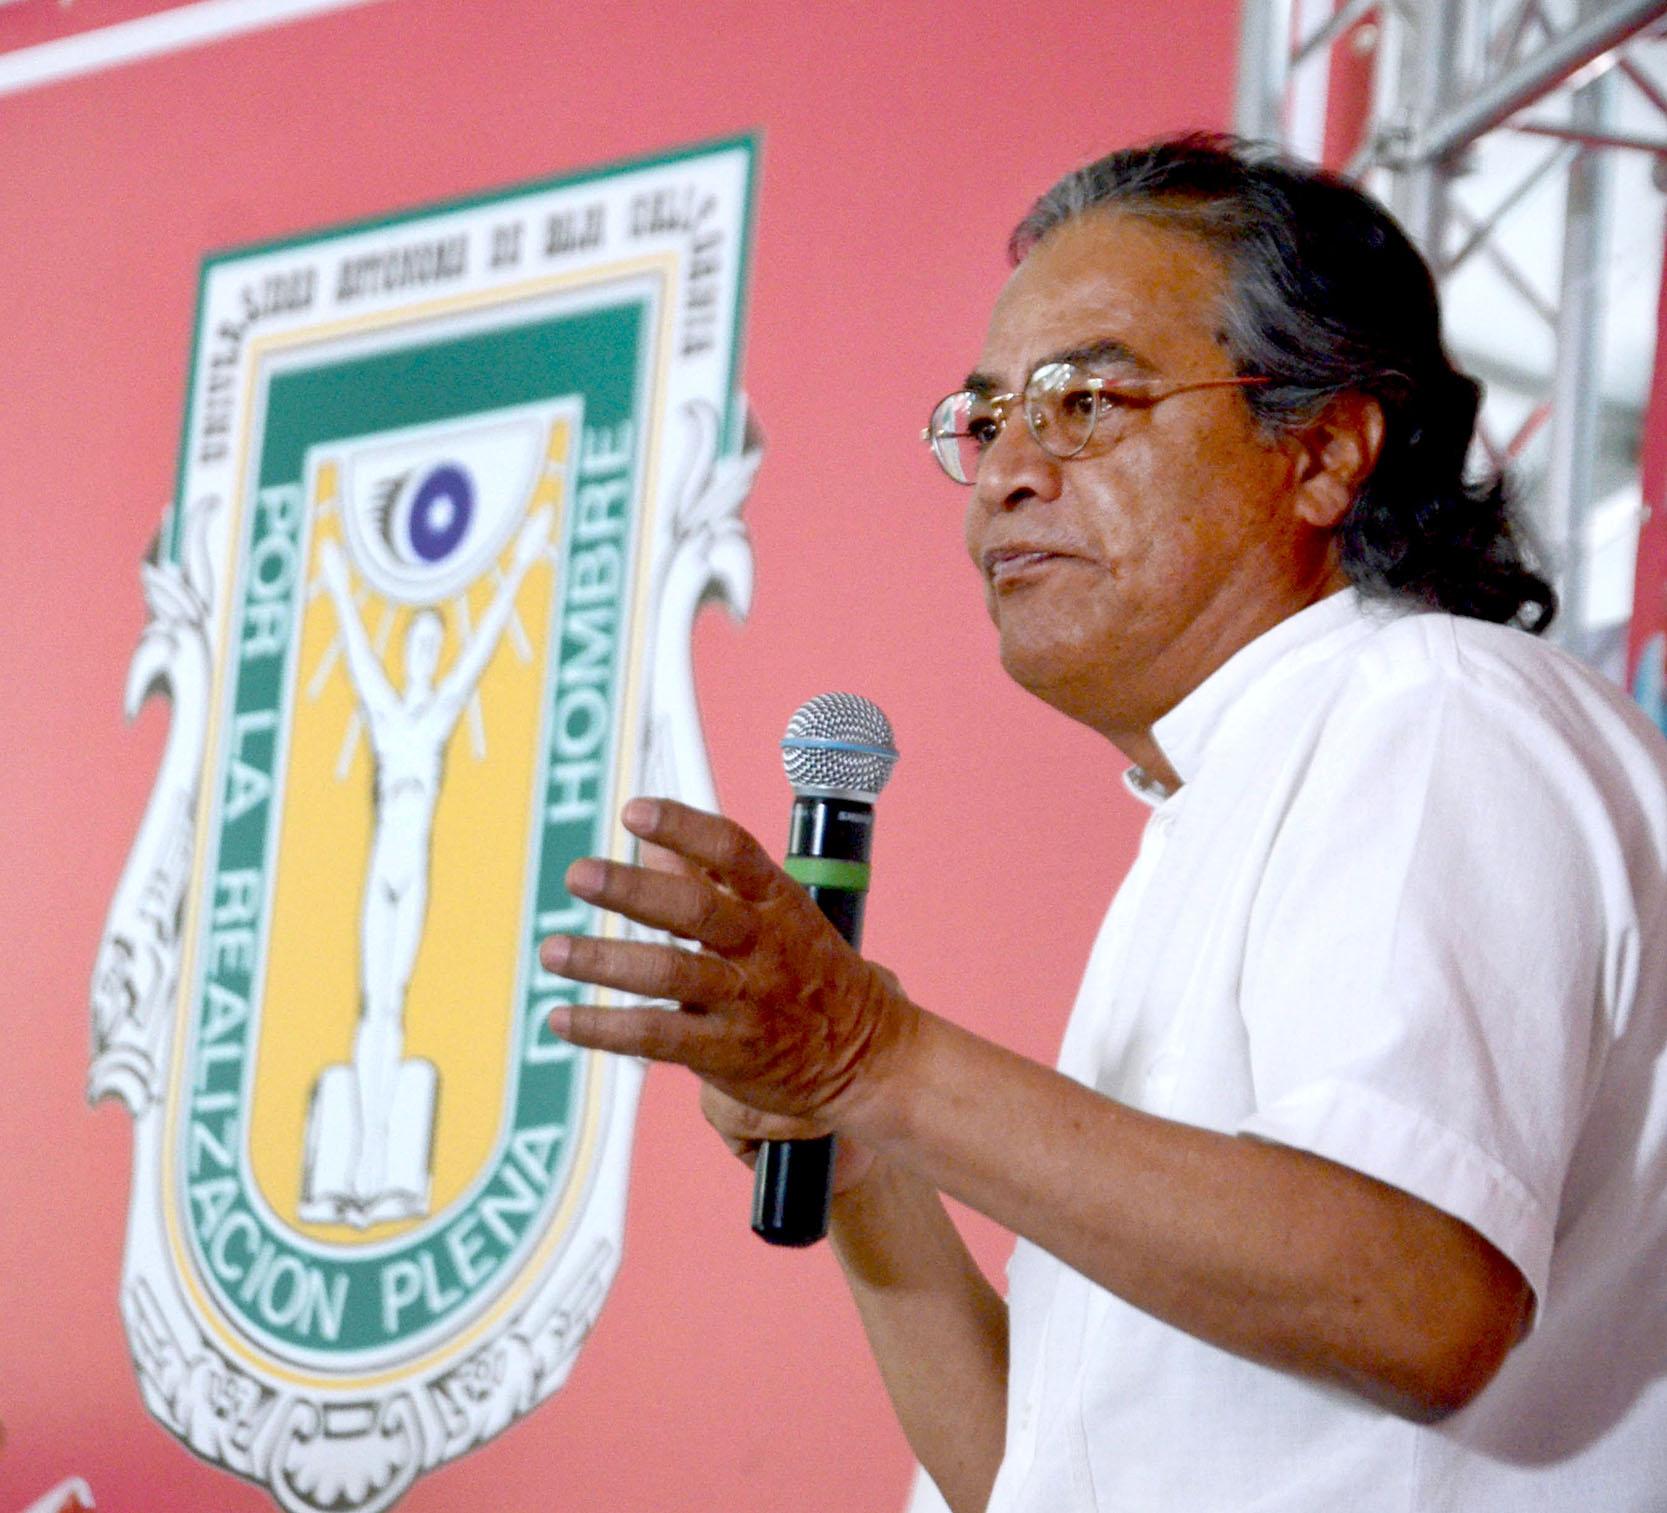 pedro valtierra en la fil de la uabc en mexicali